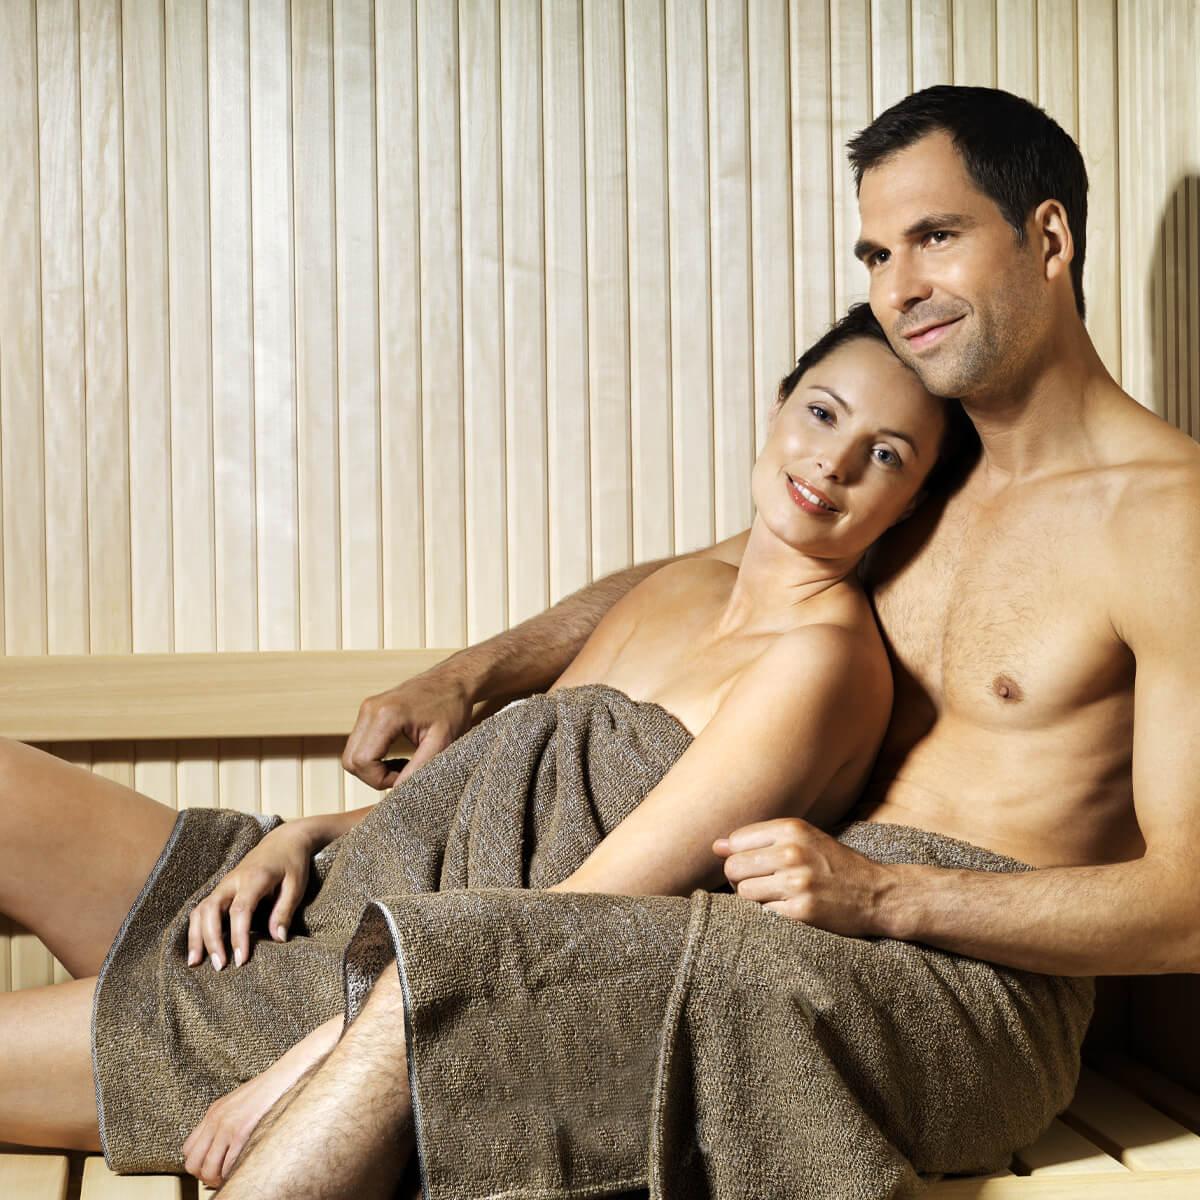 sauna-couple-1200x1200